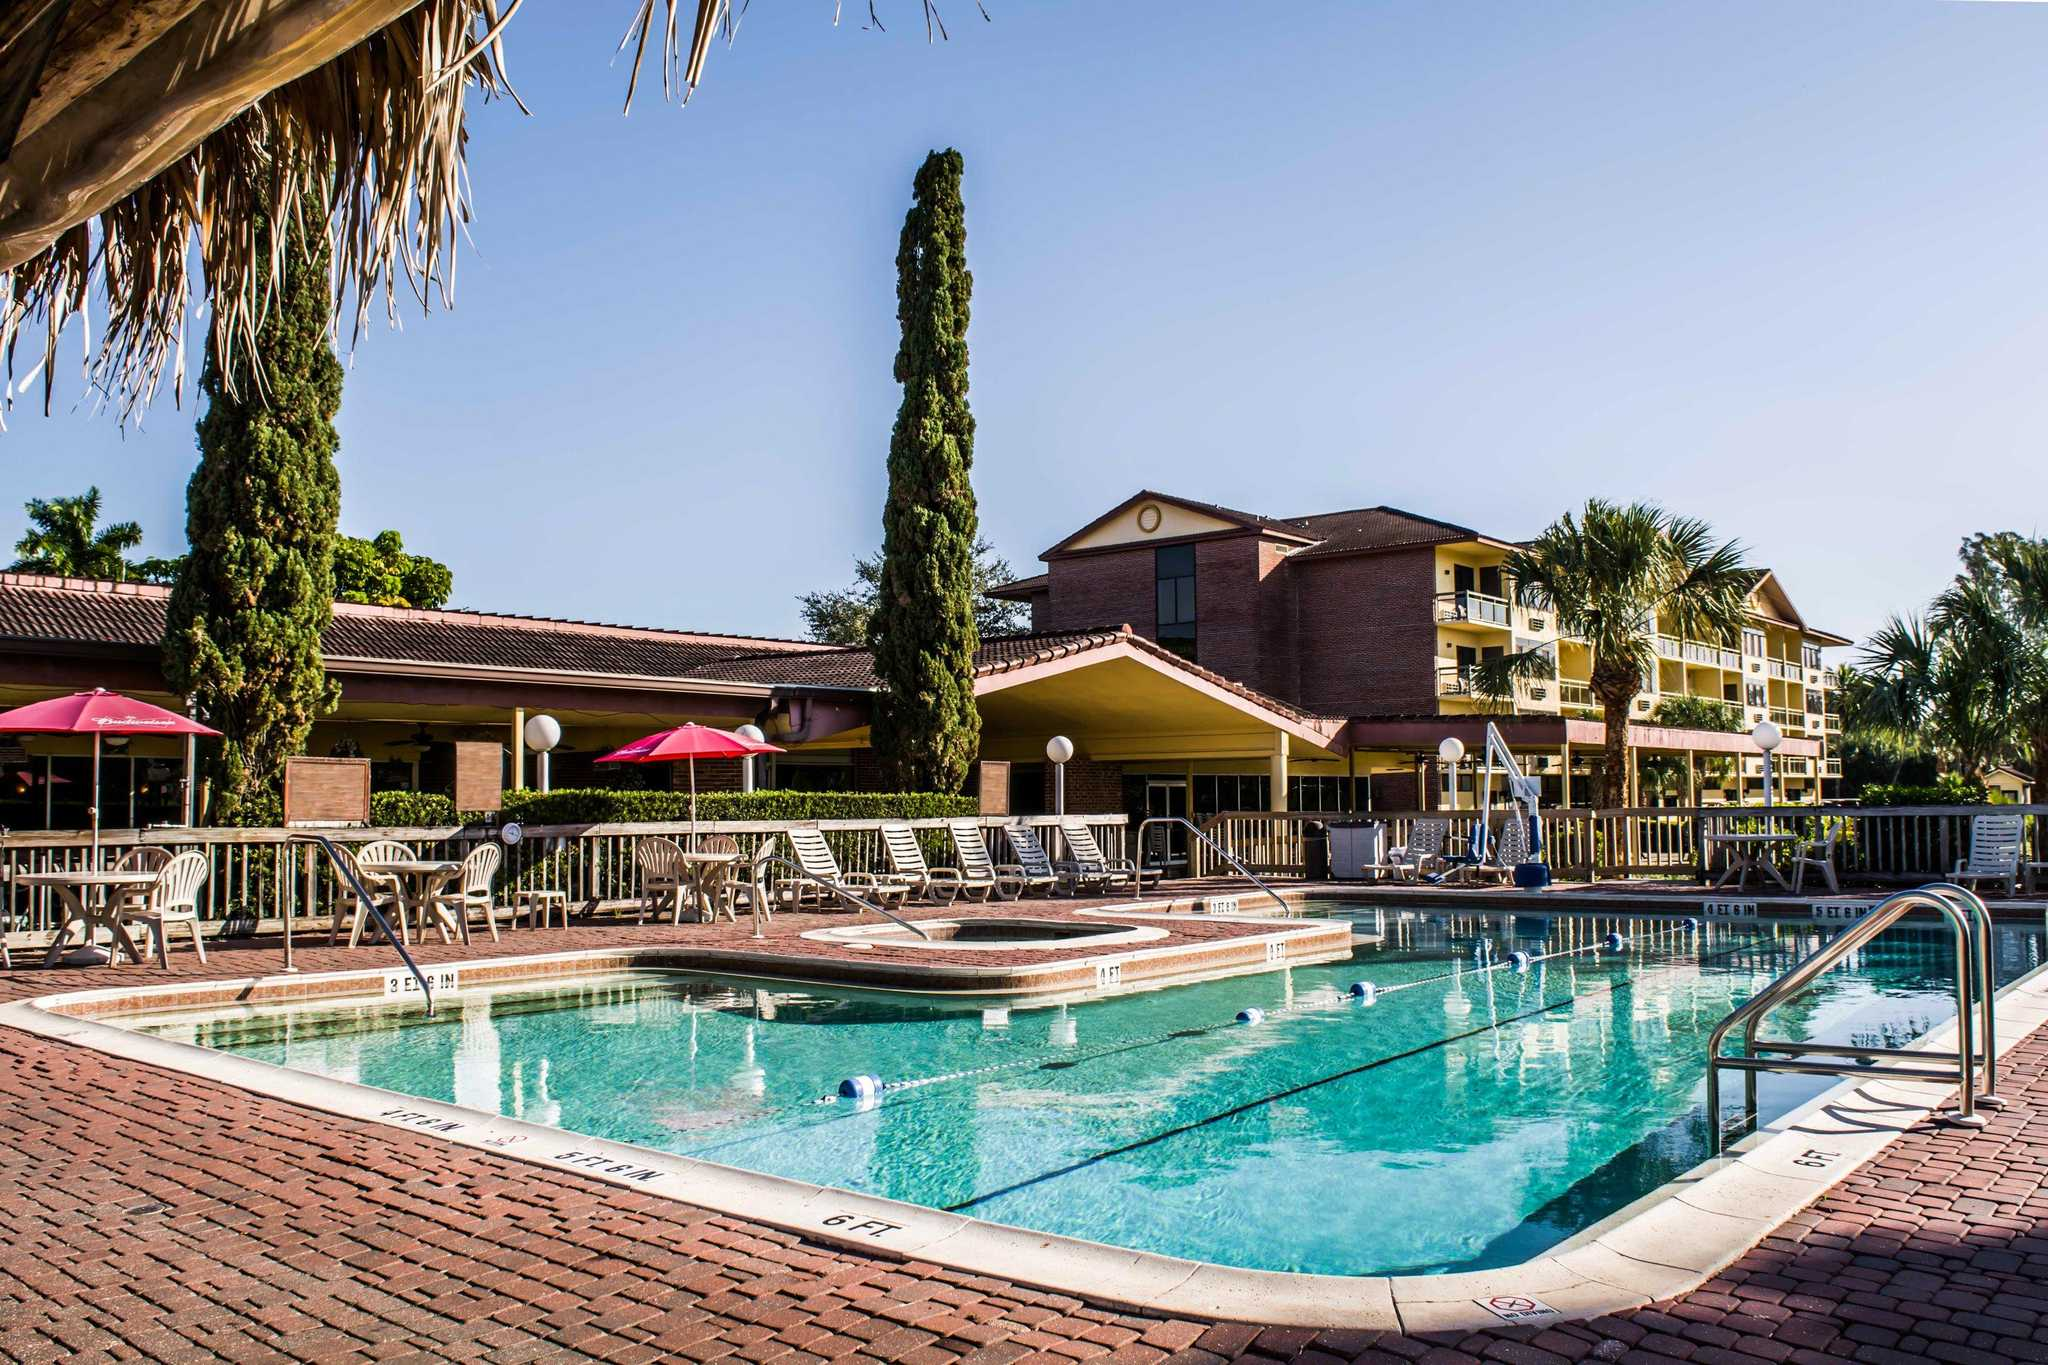 Quality inn suites golf resort in naples fl 239 455 for Hotels naples